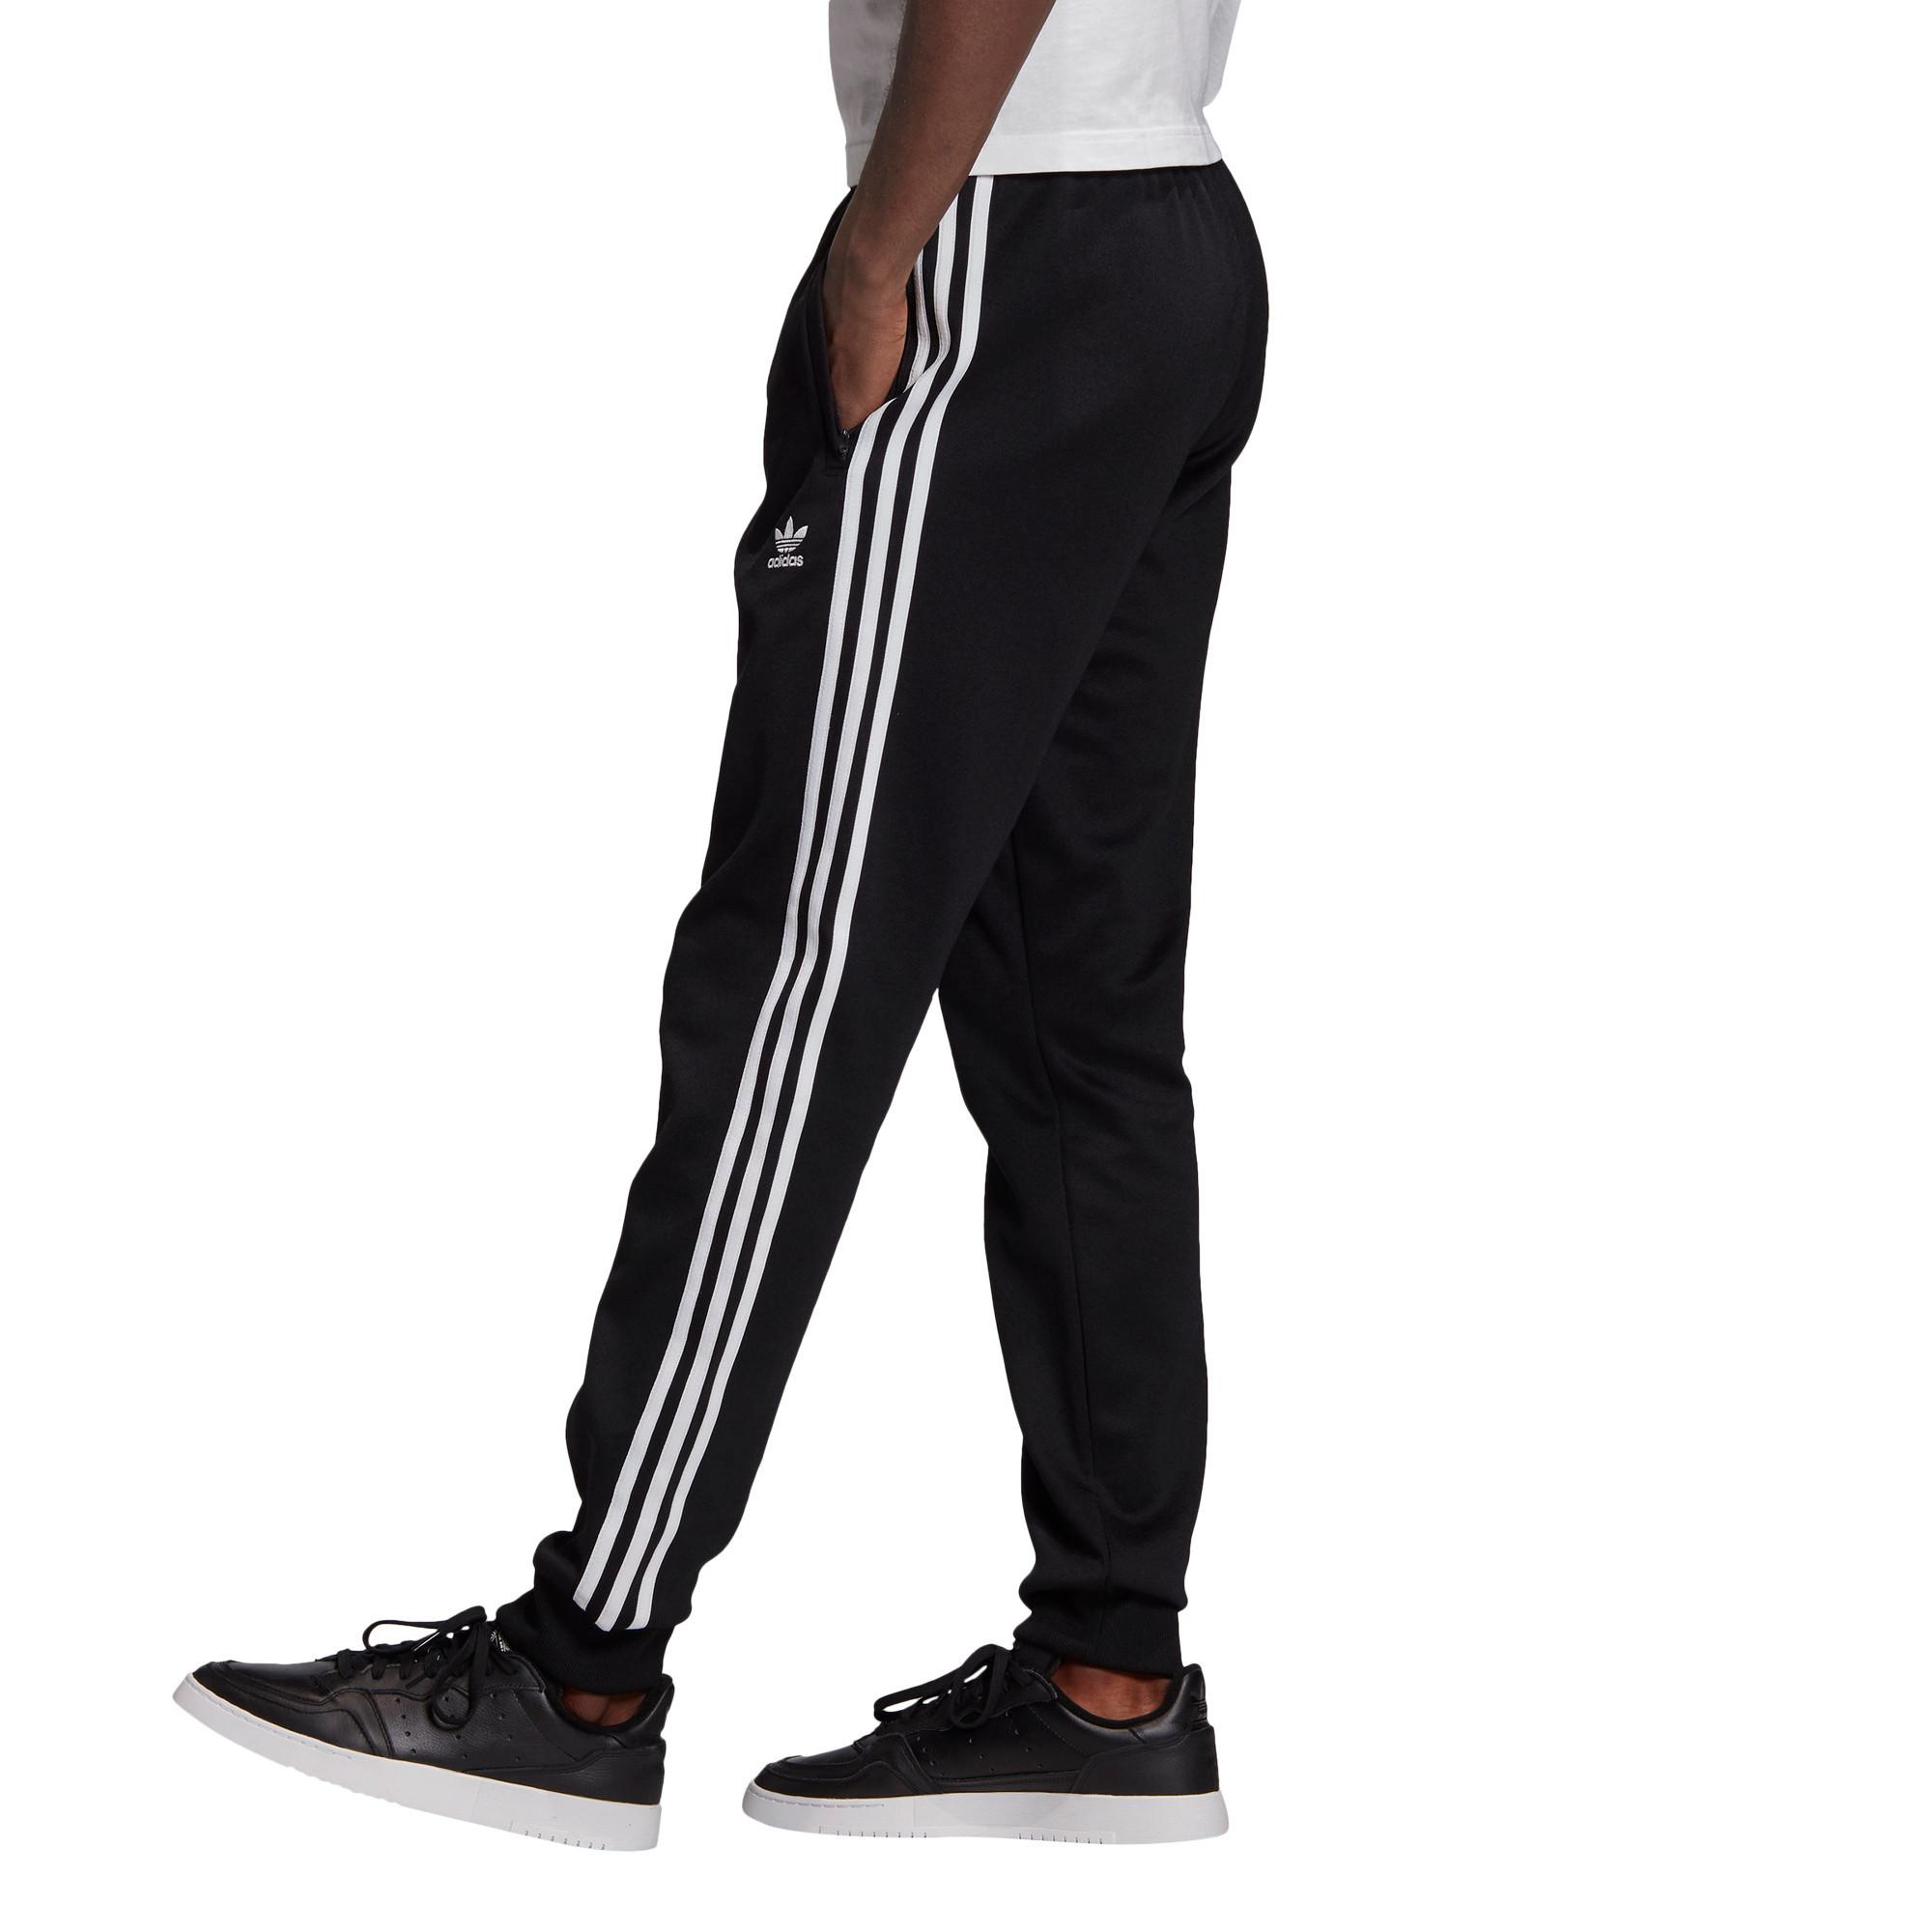 Pantaloni tuta adicolor Classics Primeblue SST, Bianco/Nero, large image number 2